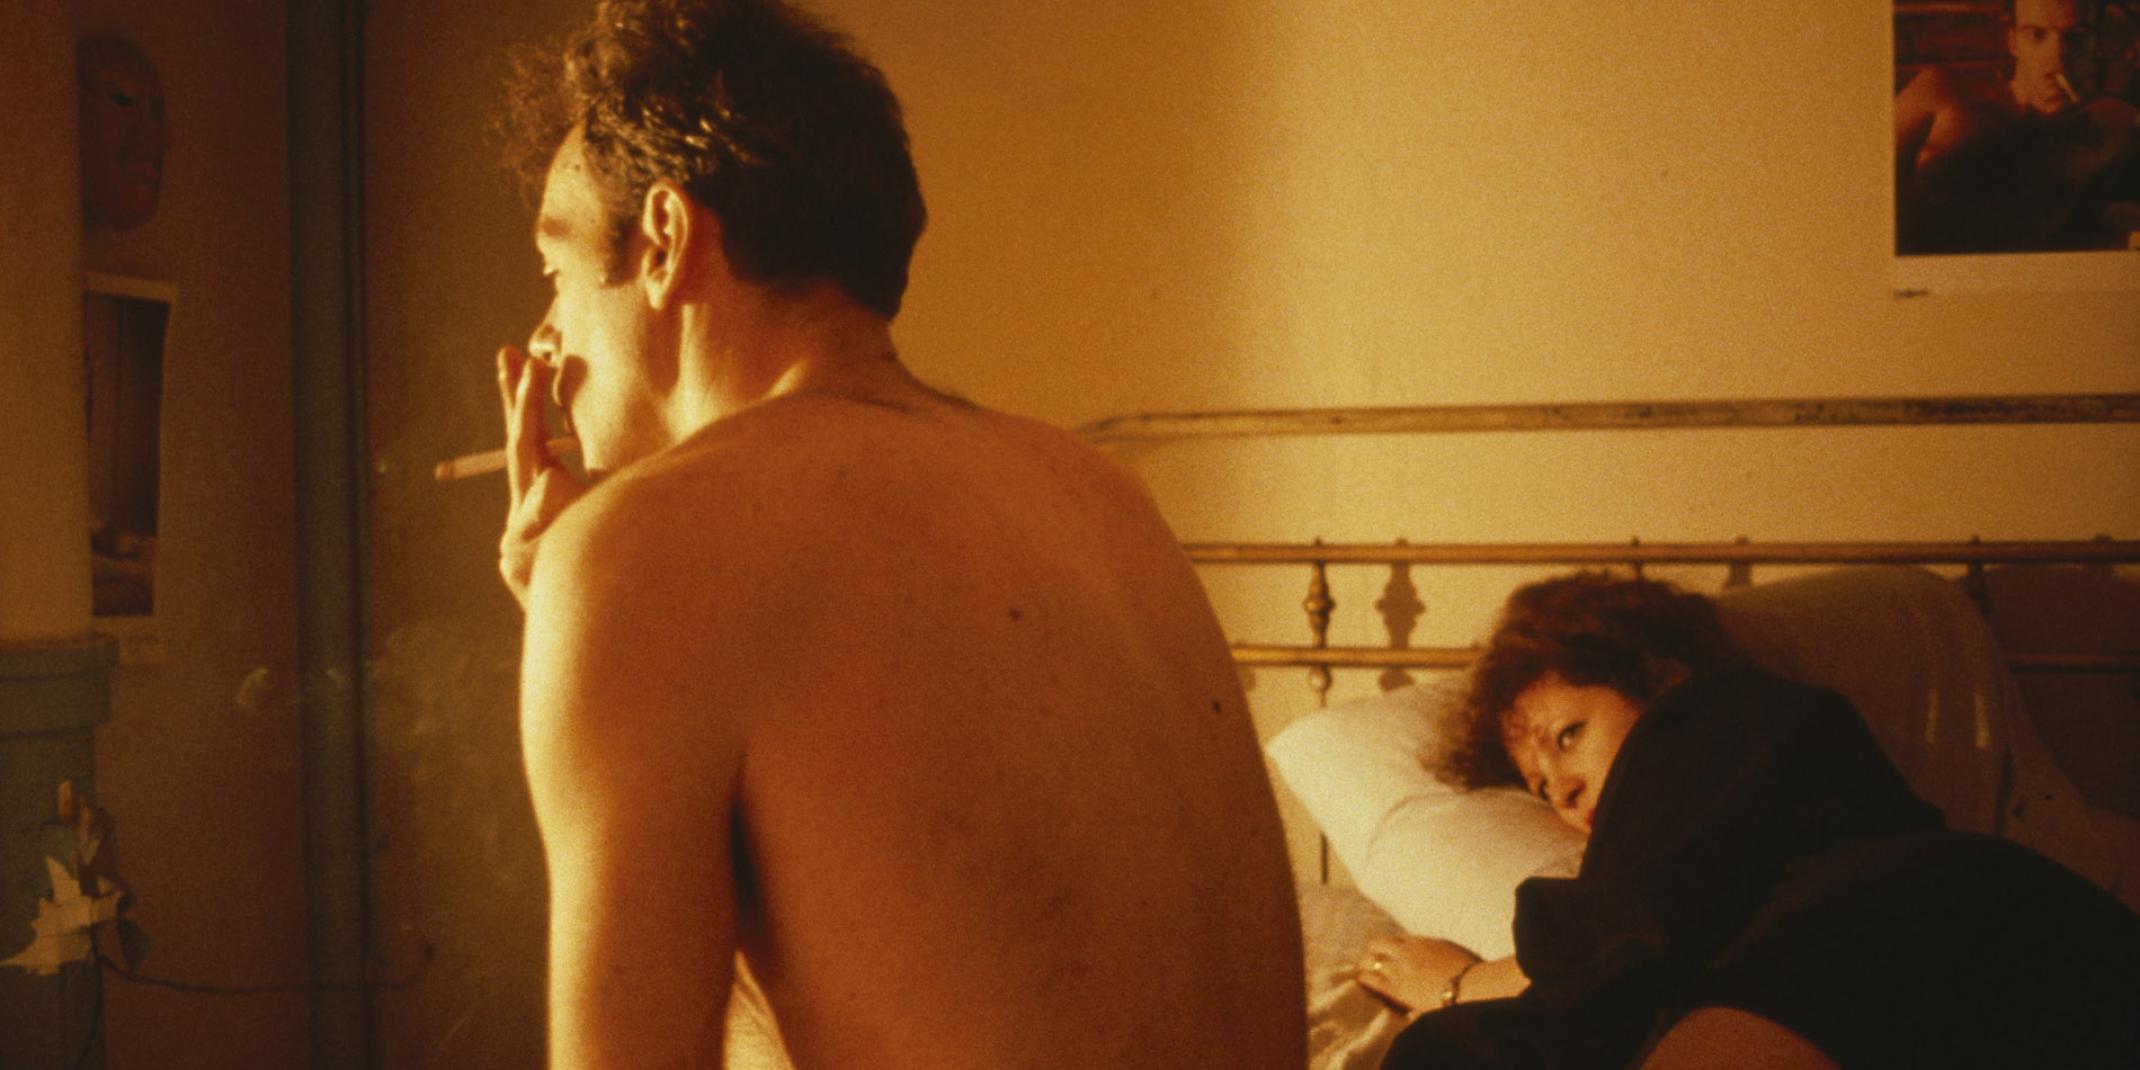 Nan Goldin (*1953), The Ballad of Sexual Dependency, 1992, 45 min, Projektionsinstallation mit 720 Kleinbilddias (9 Dia-Projektoren, 1 Steuergerät, 3 Programmboxen, 1 Programm/ Tonband), © Nan Goldin